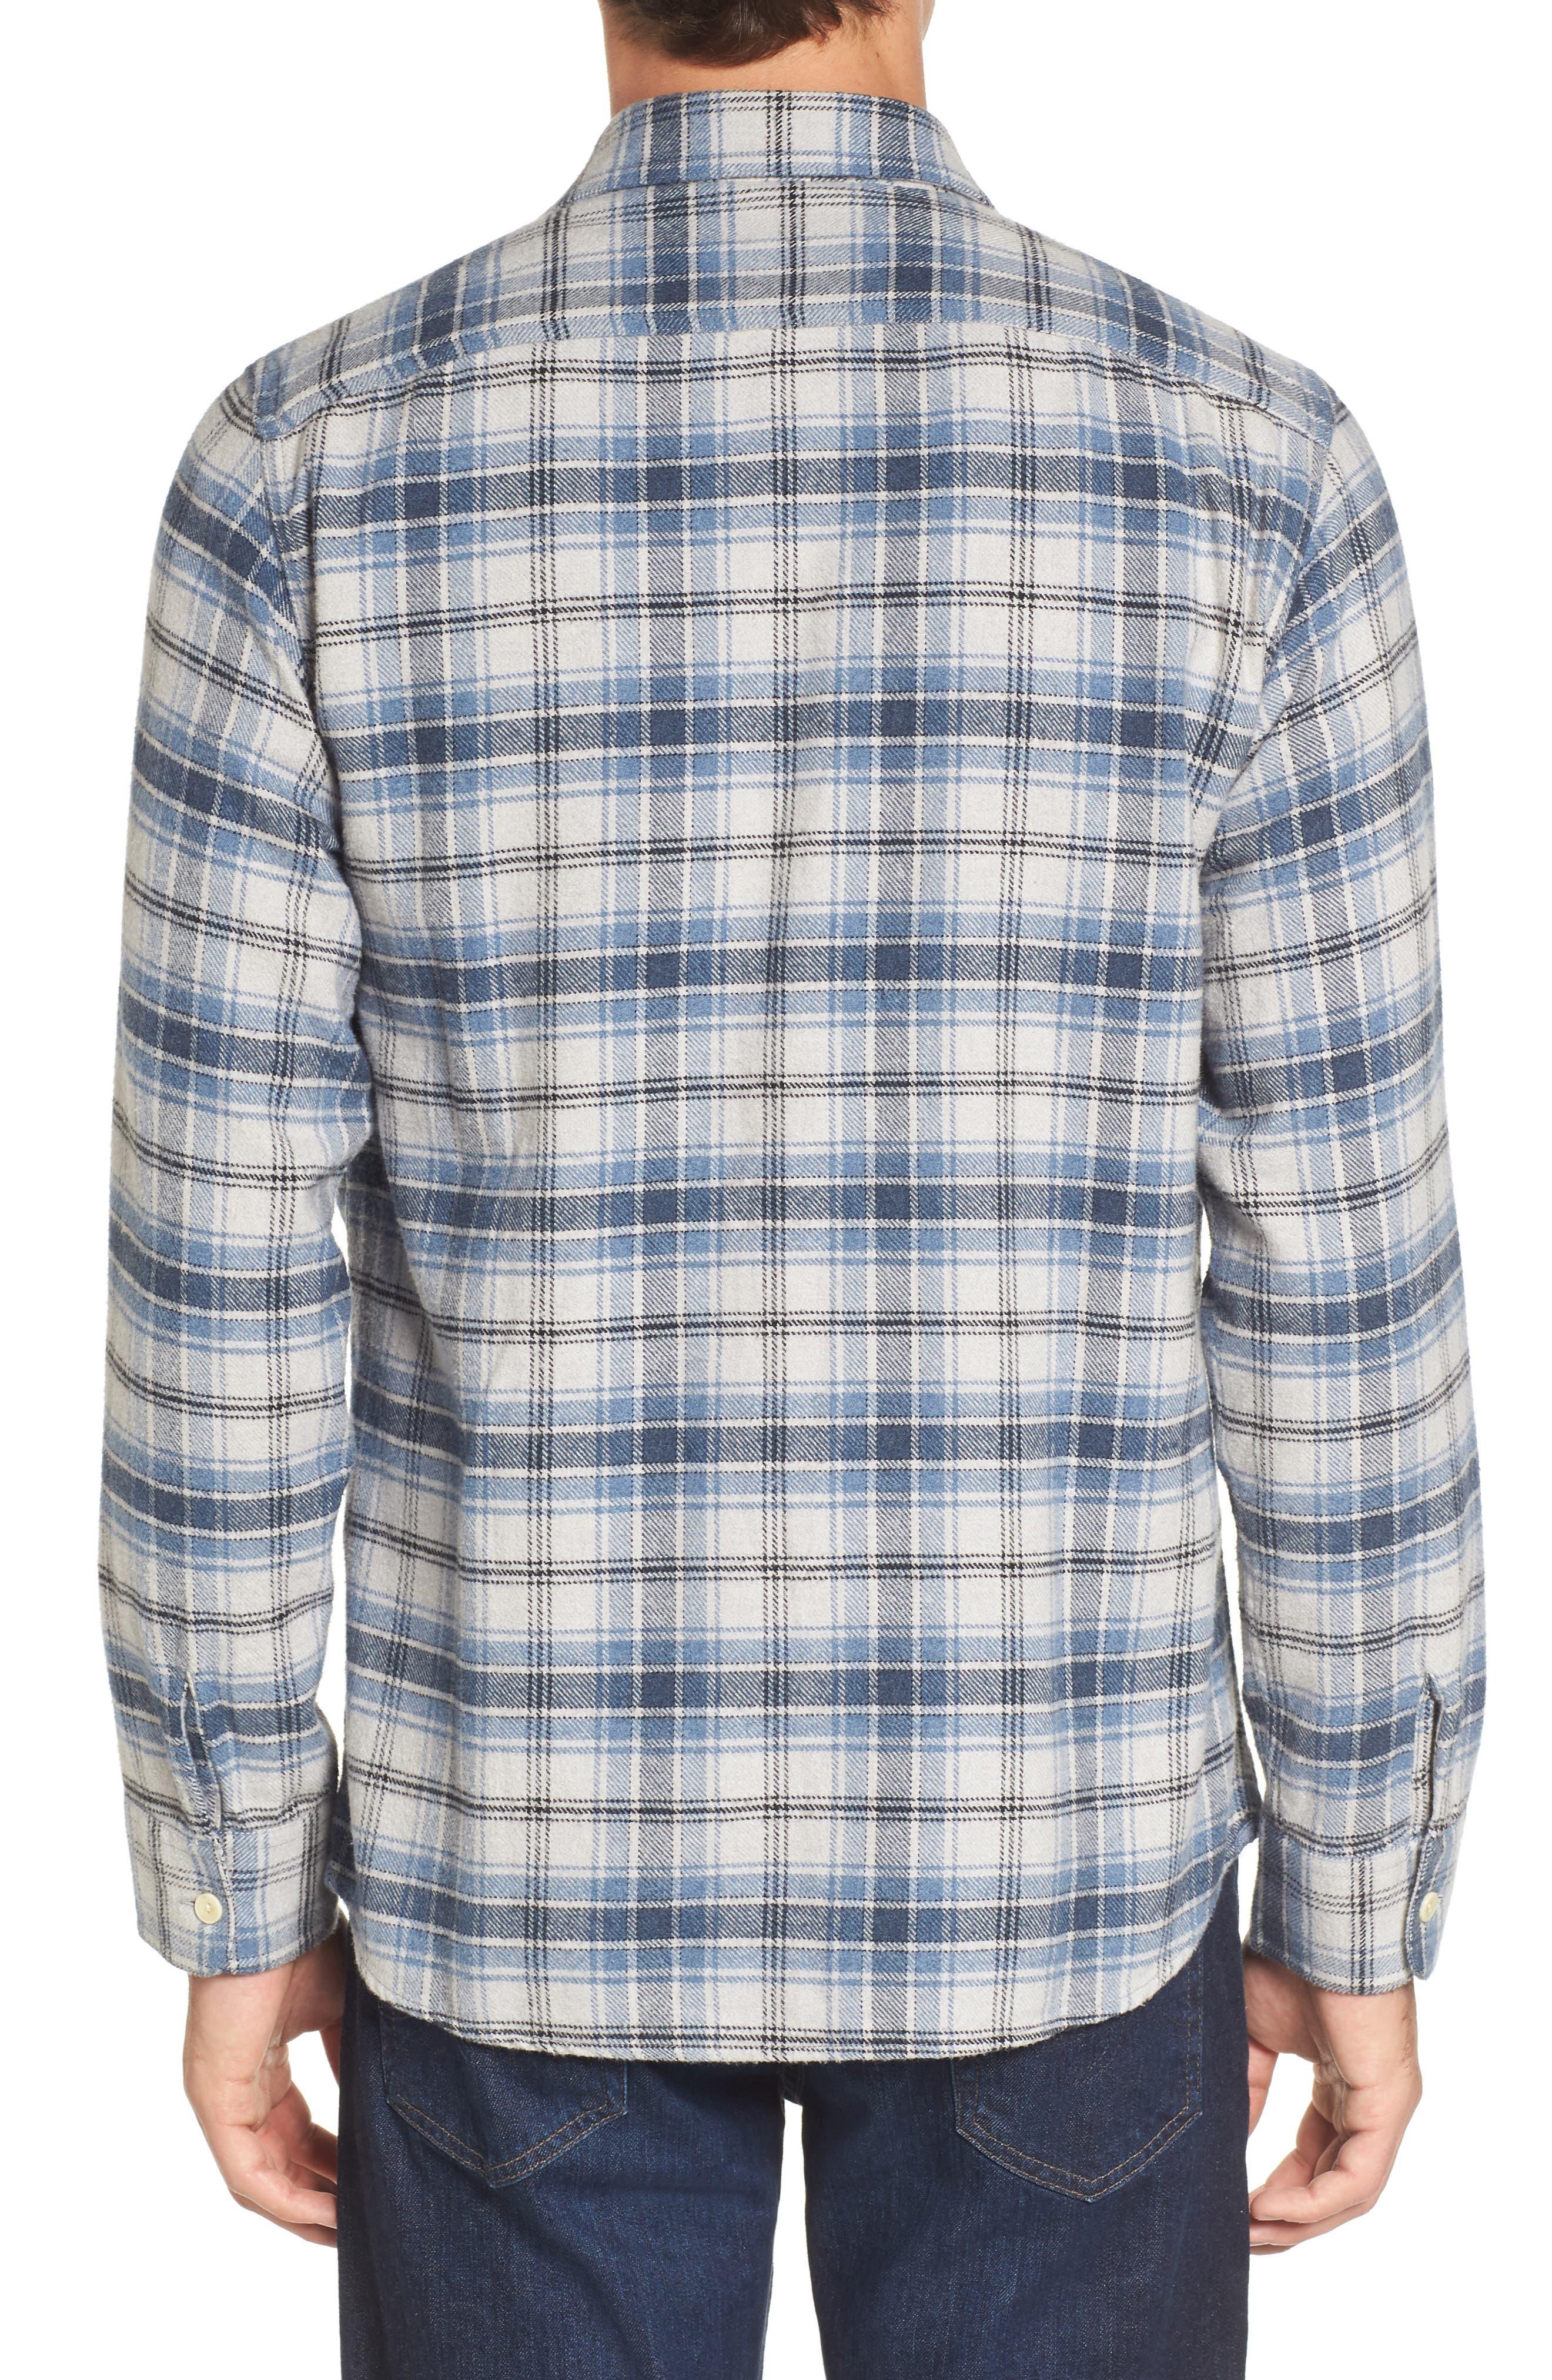 Campton Heritage Plaid Flannel Shirt,                             Alternate thumbnail 2, color,                             Blue Stone